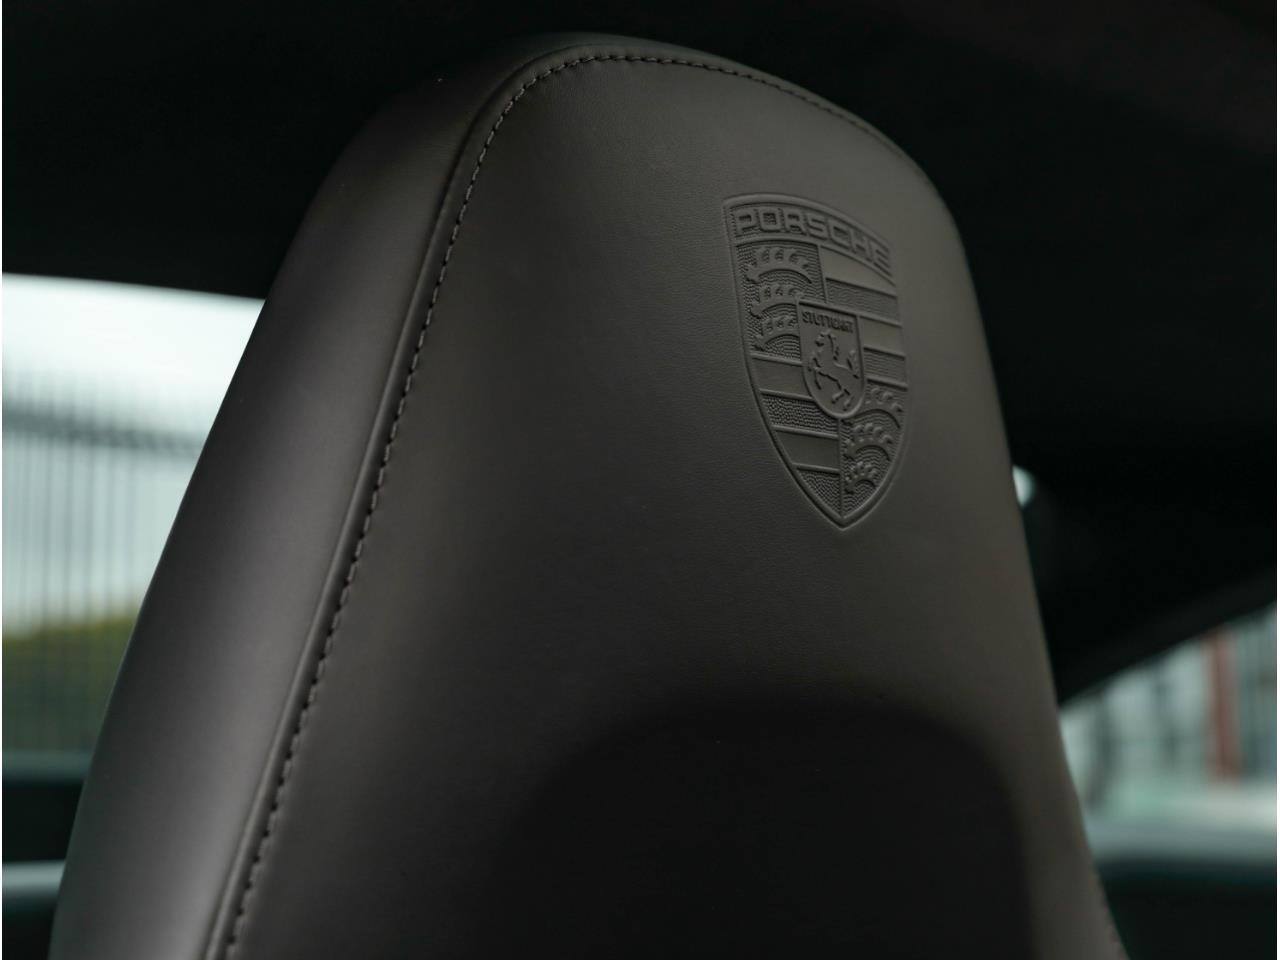 Large Picture of 2014 Porsche 911 located in Marina Del Rey California - $119,500.00 - Q6GN